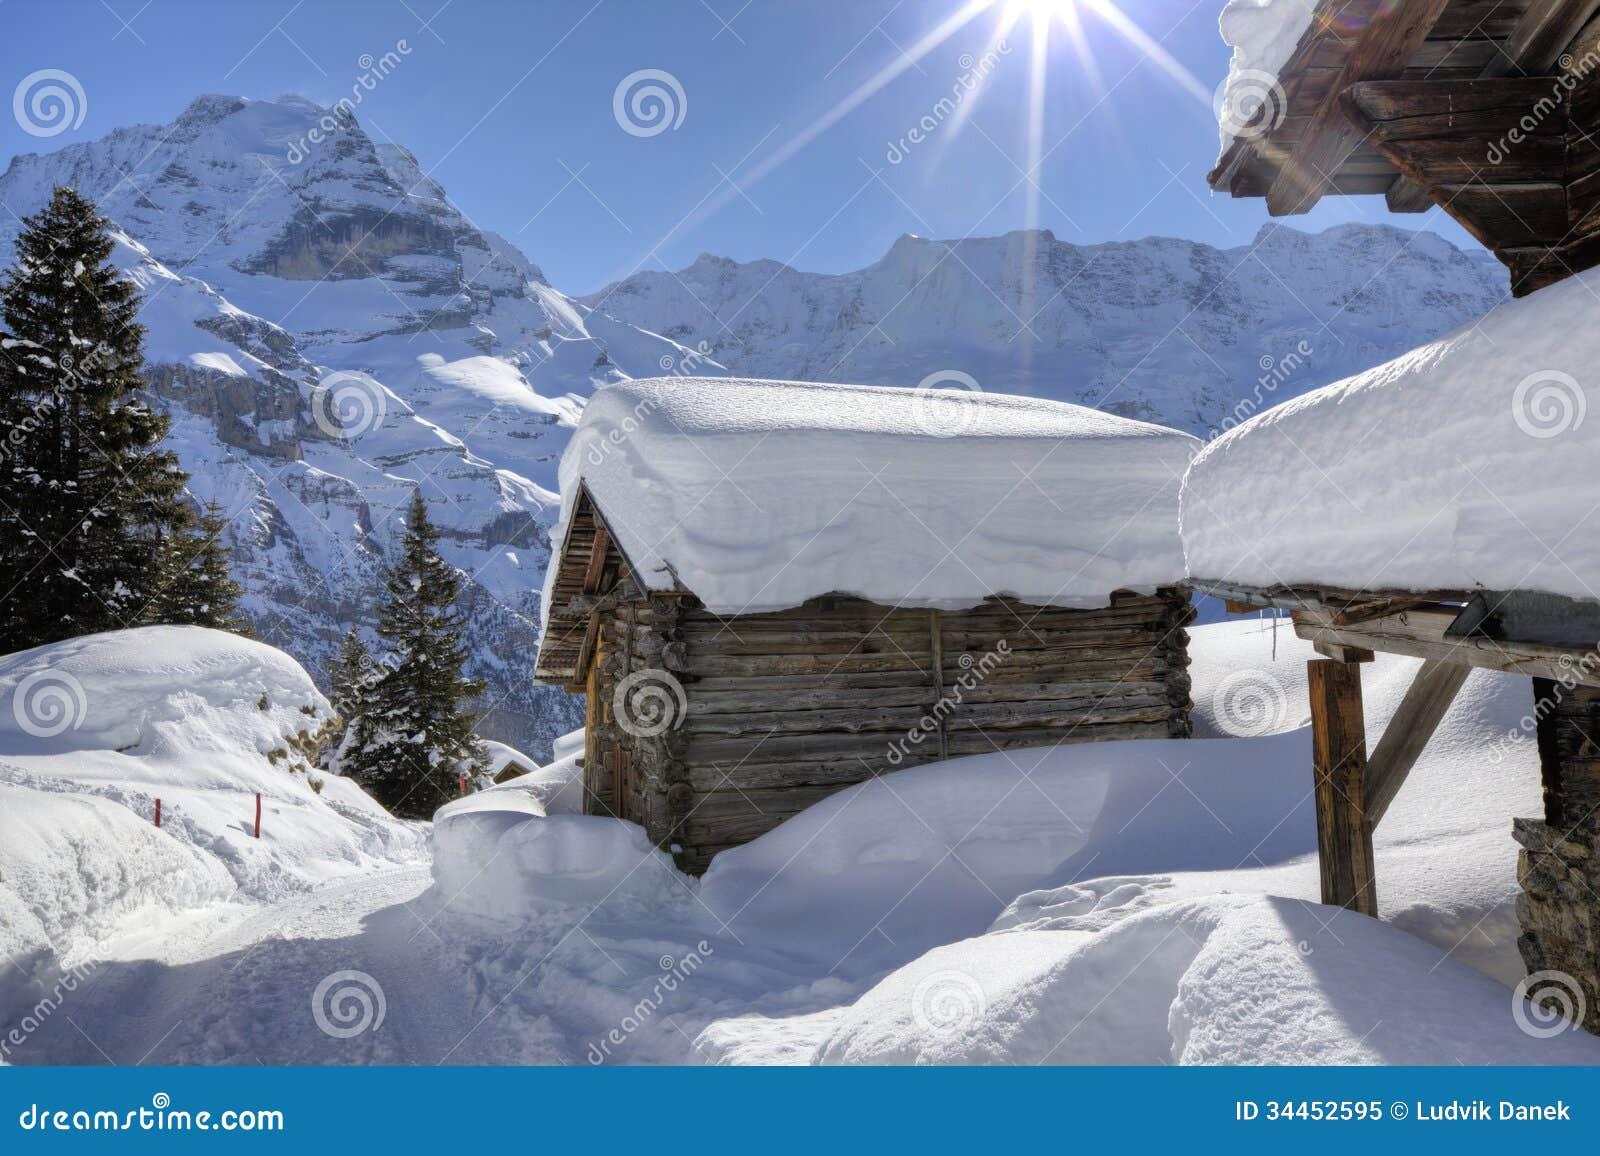 Snow in Swiss Alps